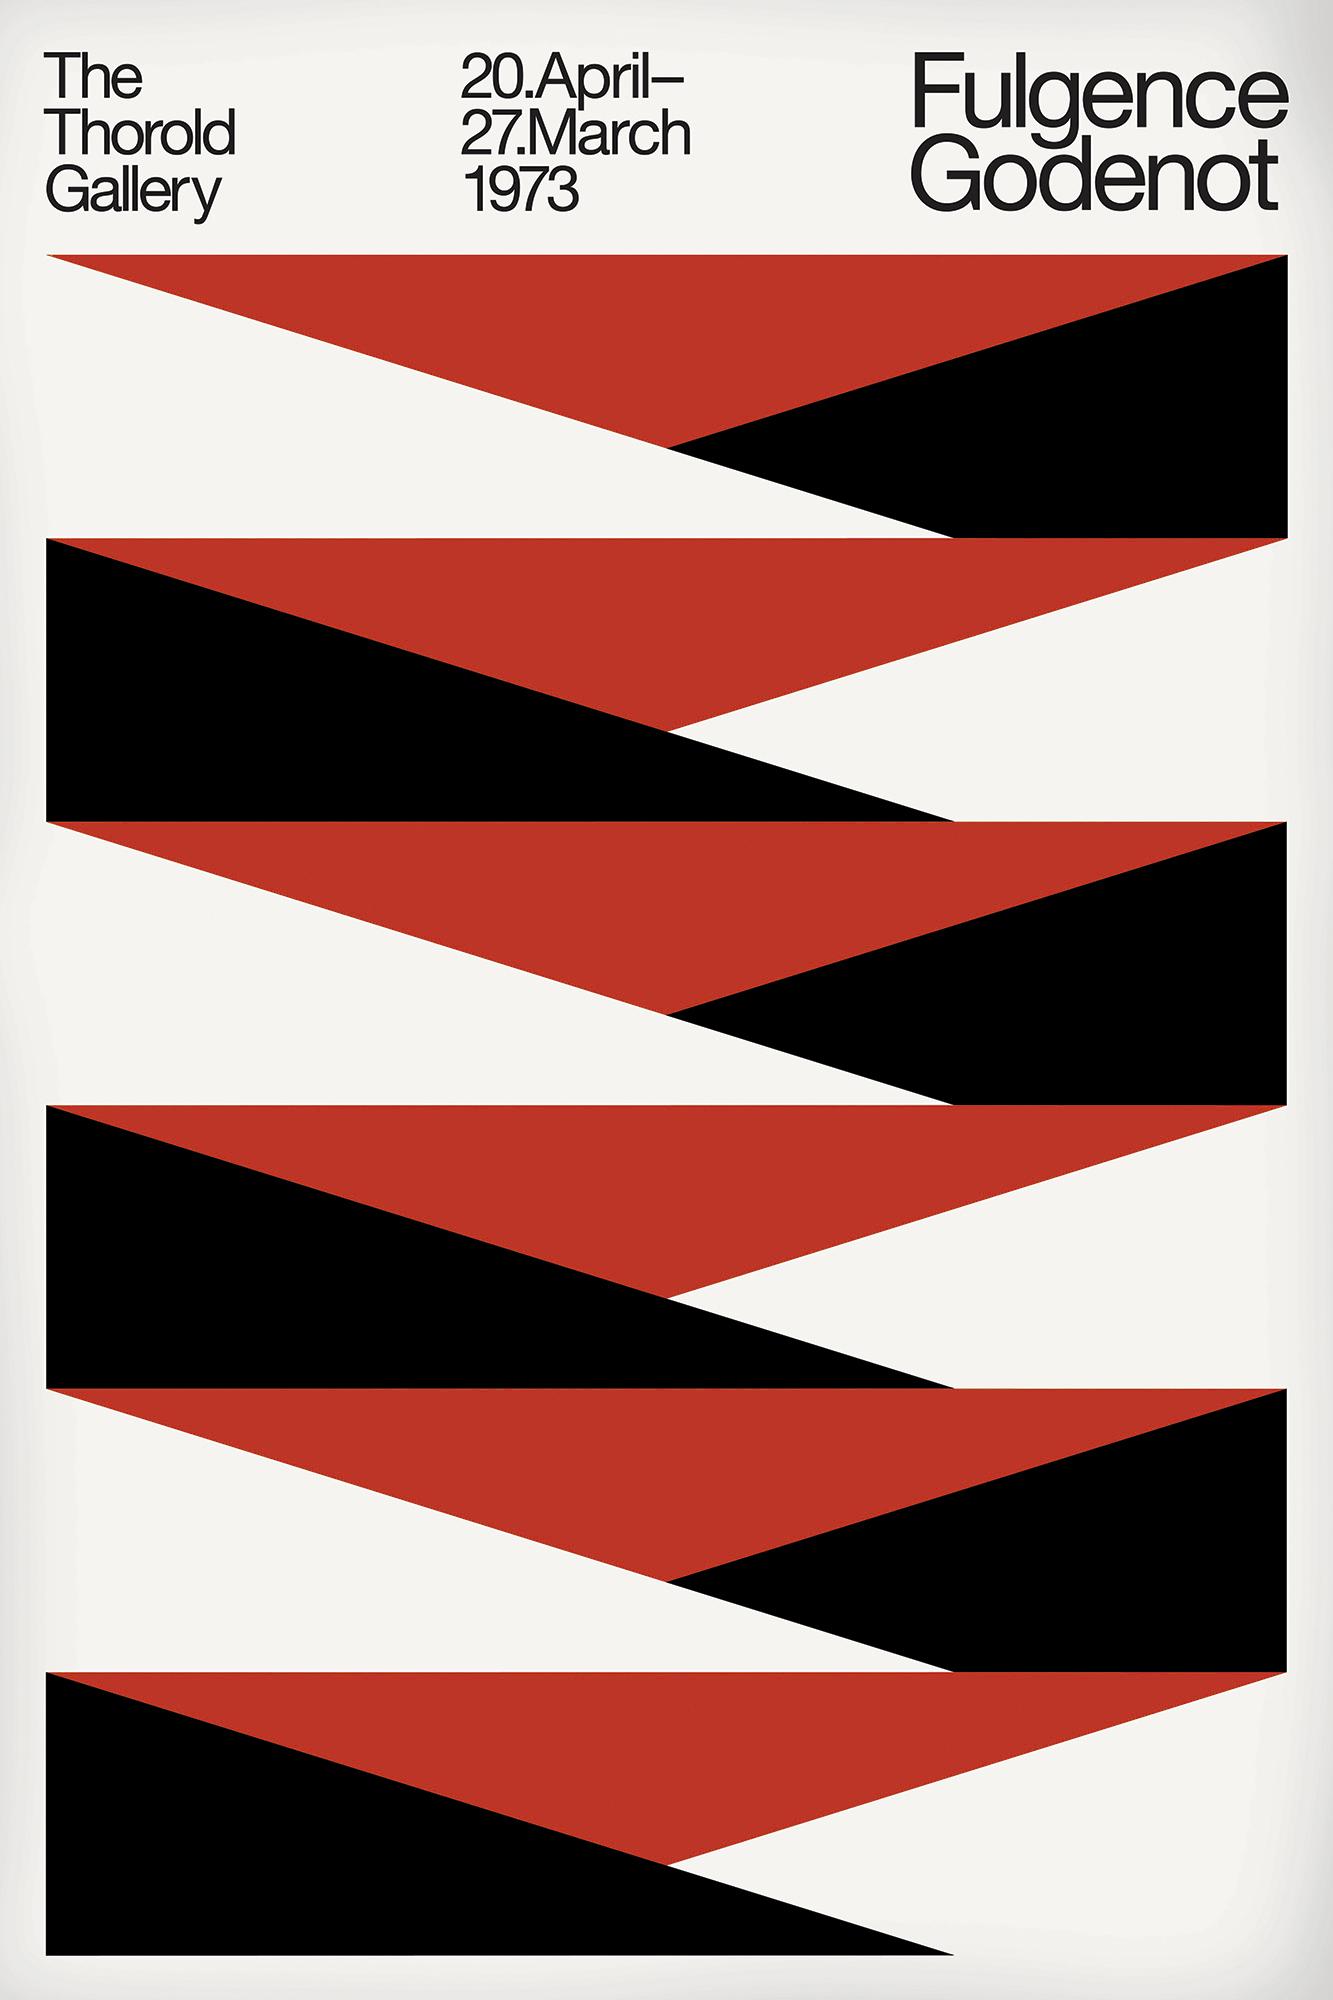 Montague-Fictions-Fulgence2.jpg